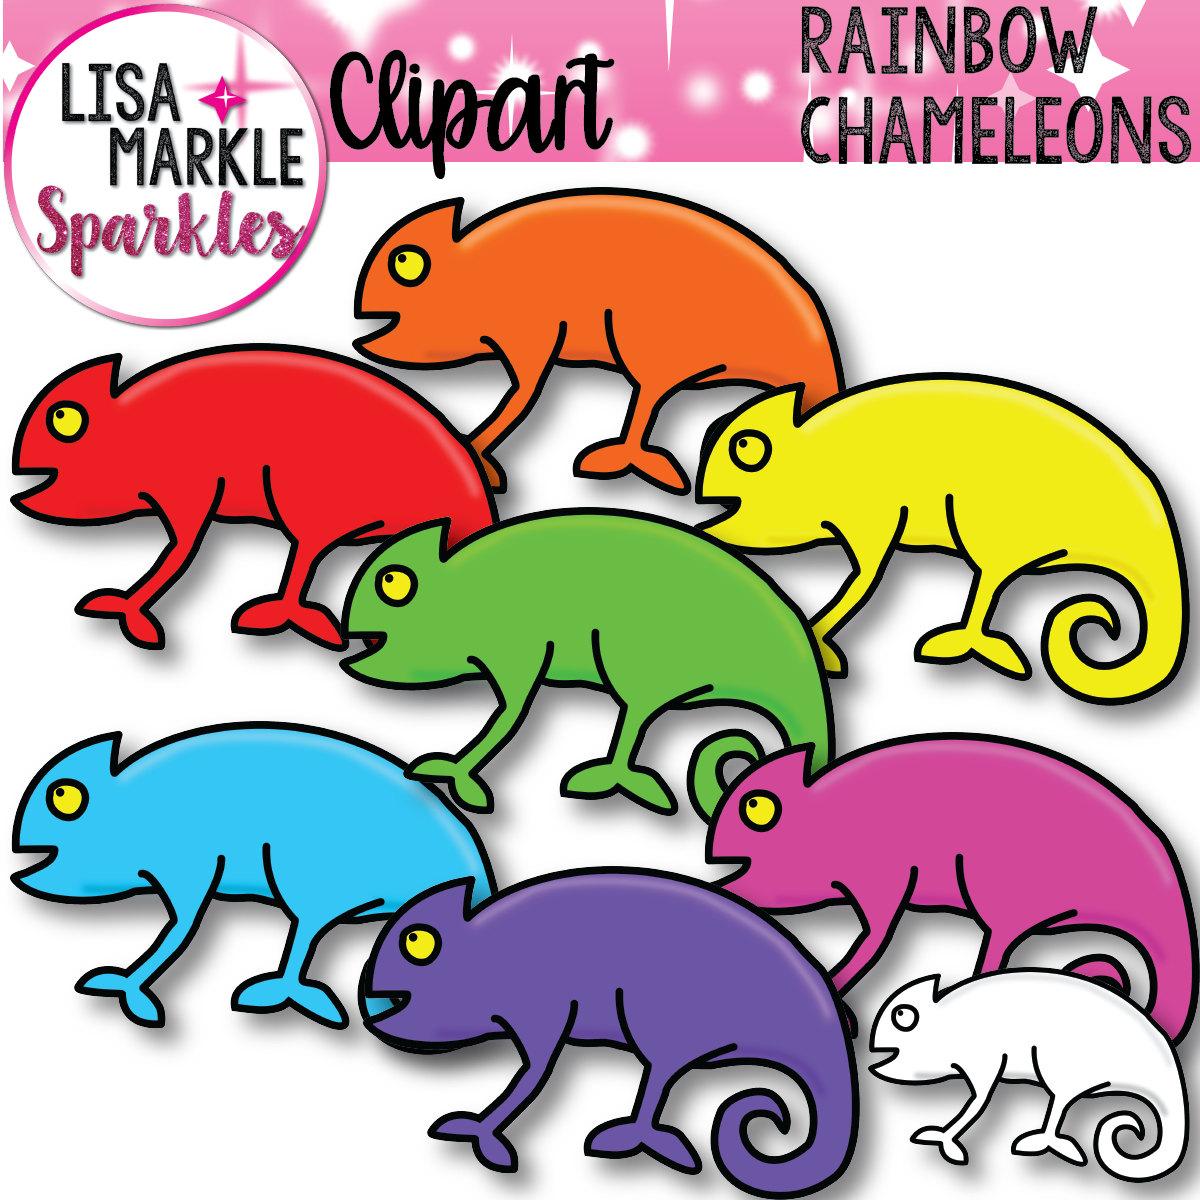 Rainbow Clipart, Chameleons Clipart, Reptile Clipart, Lizard.